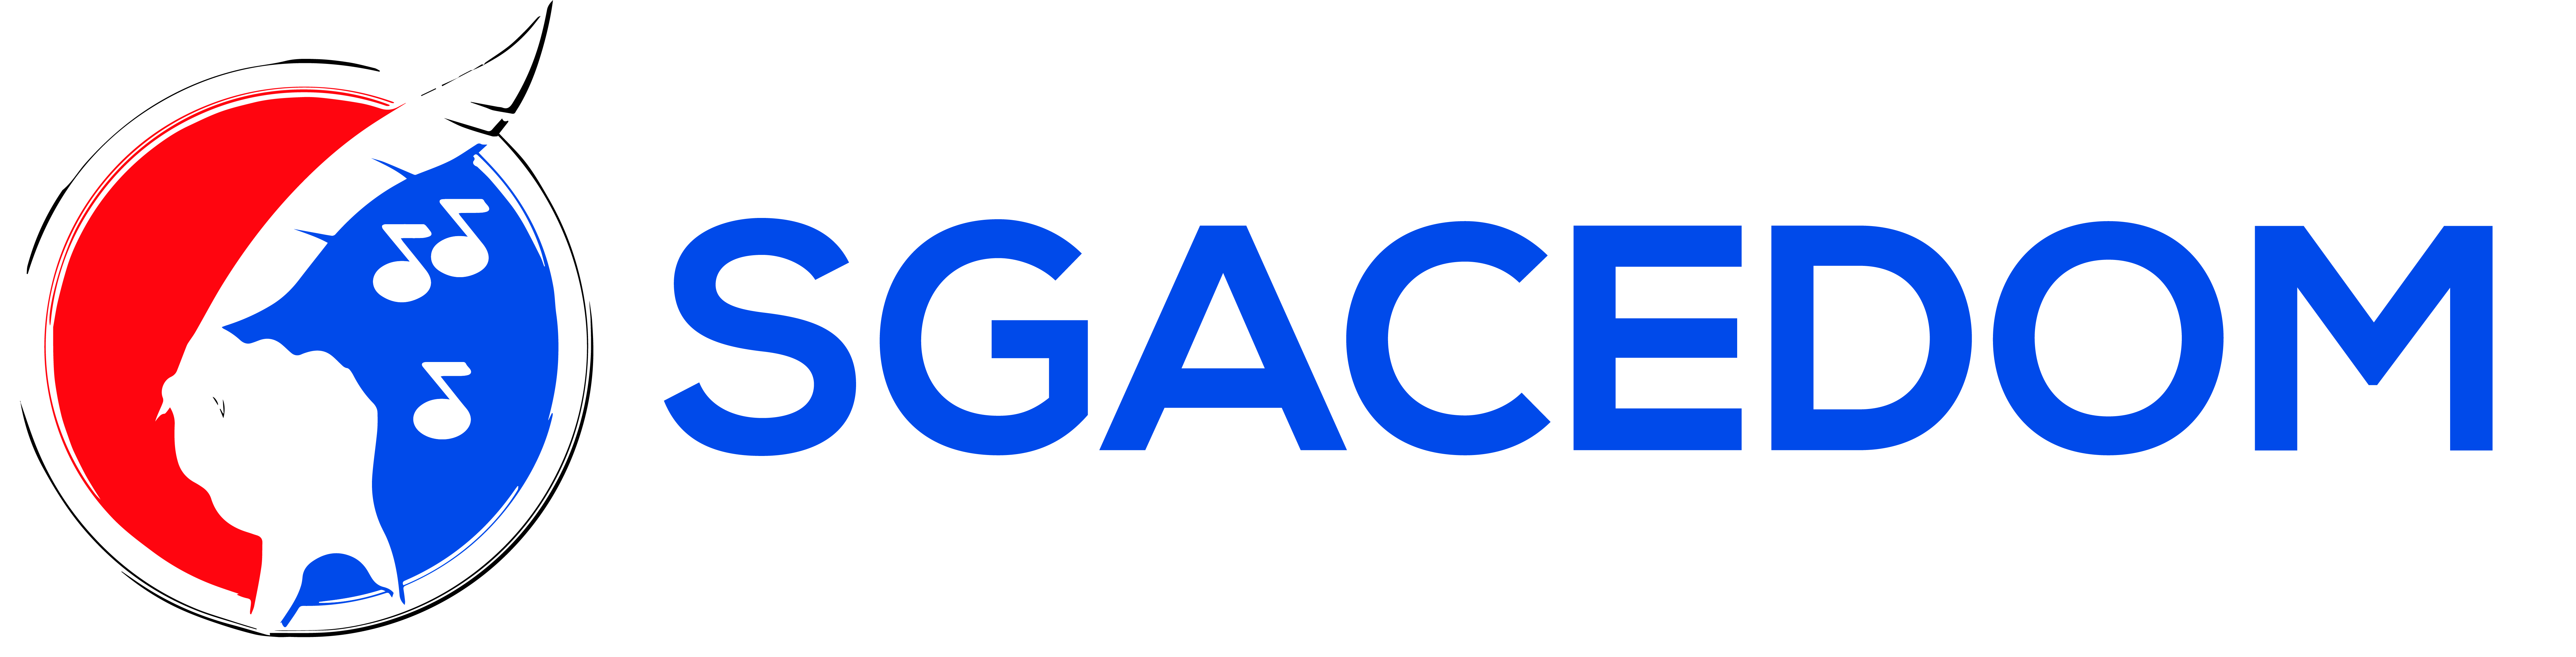 SGACEDOM